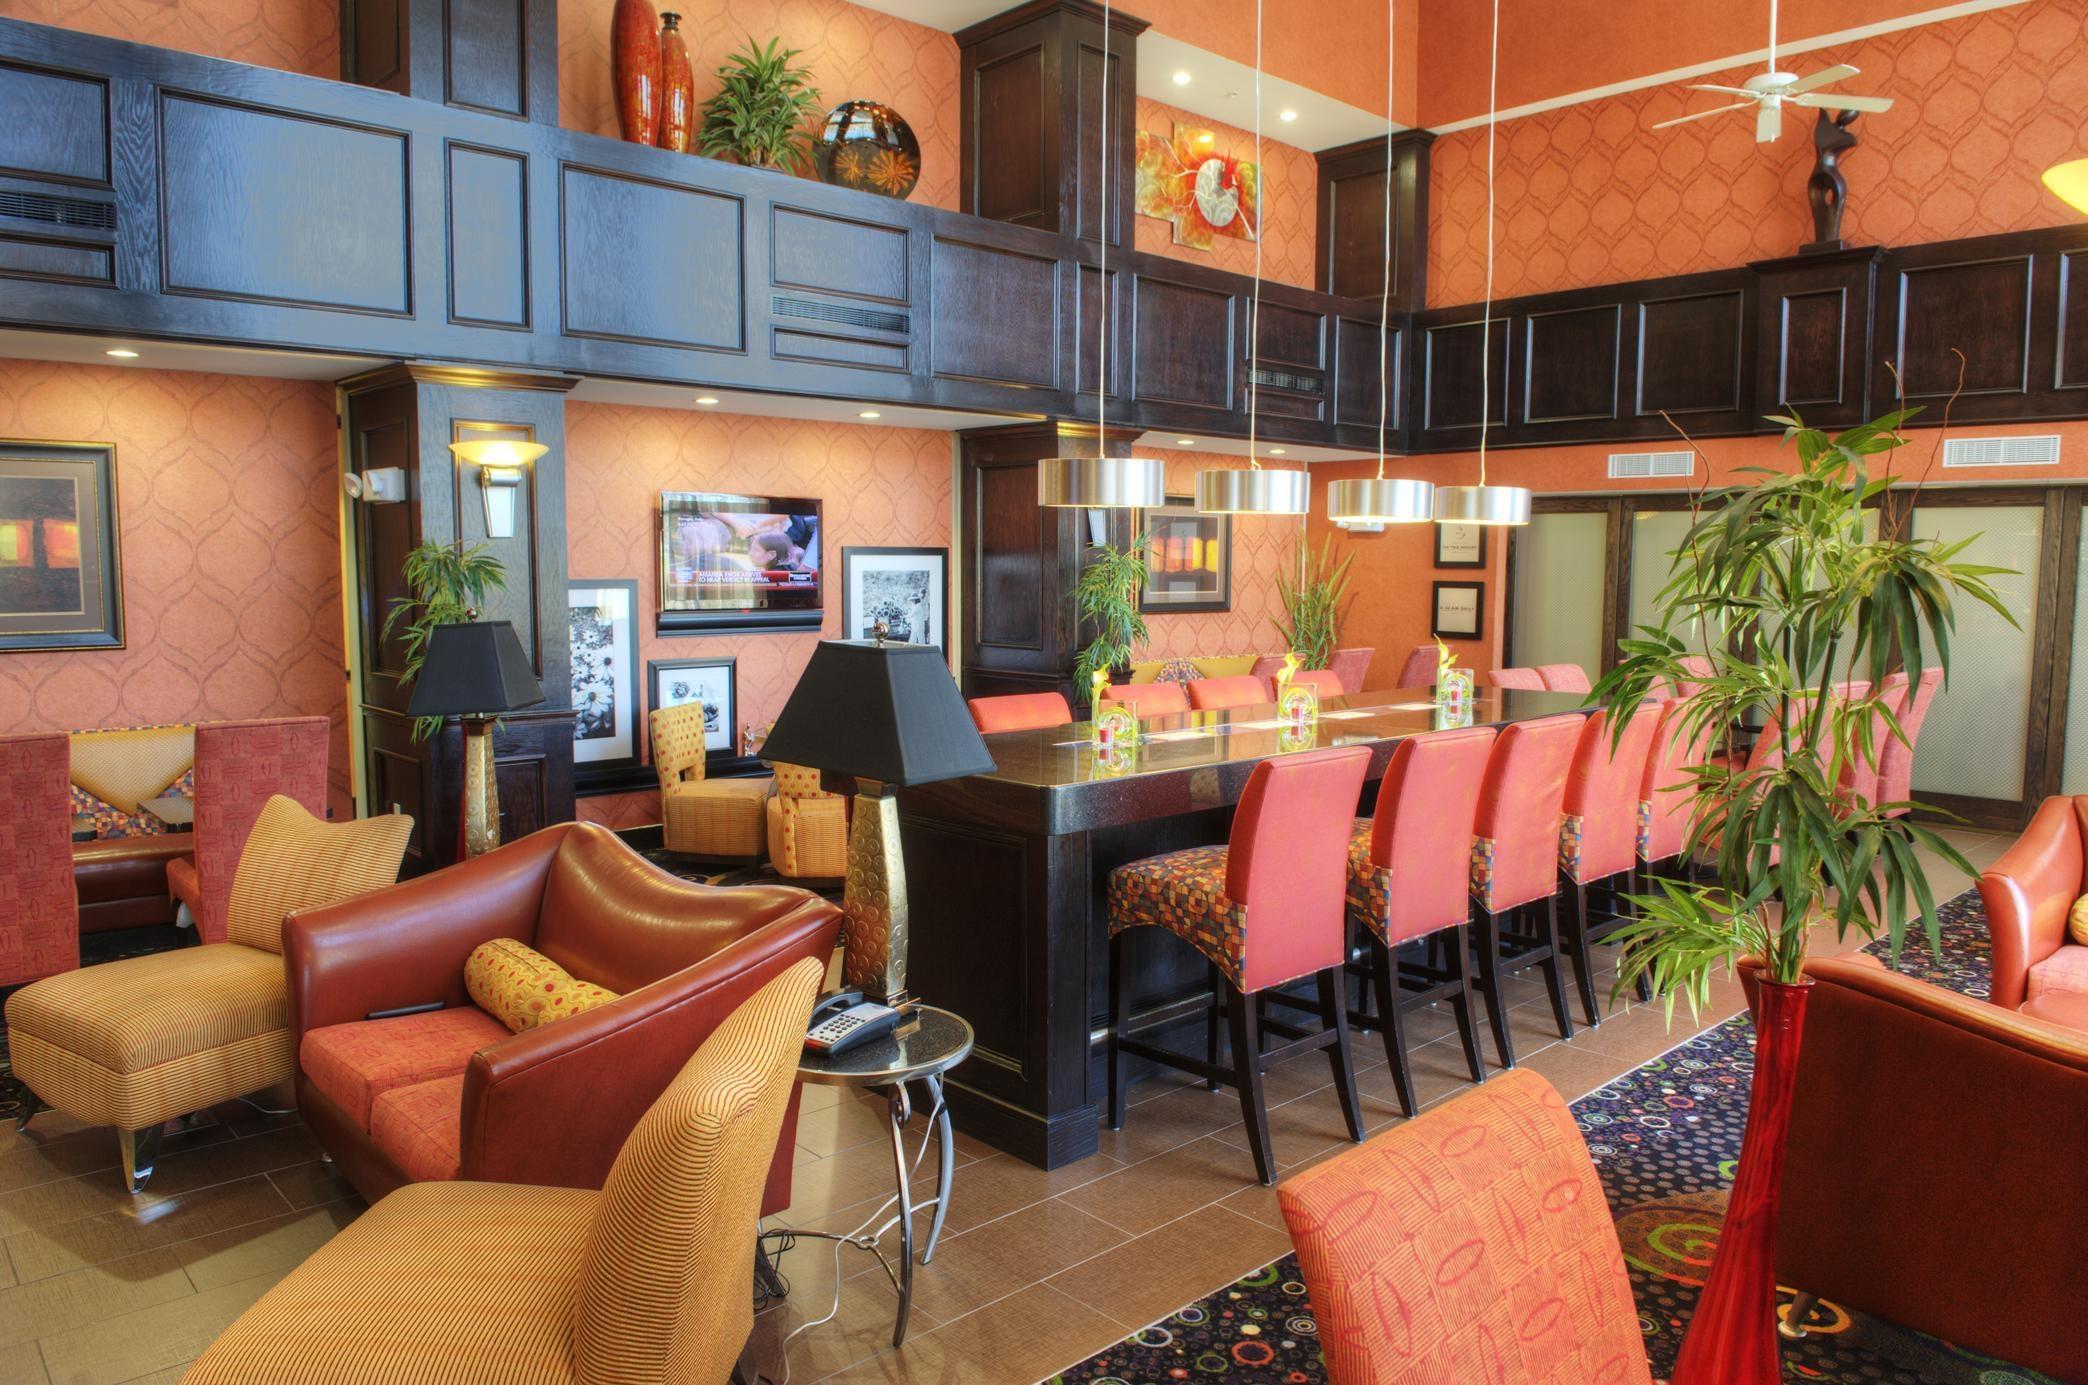 Hampton Inn & Suites Dallas/Lewisville-Vista Ridge Mall, TX image 8